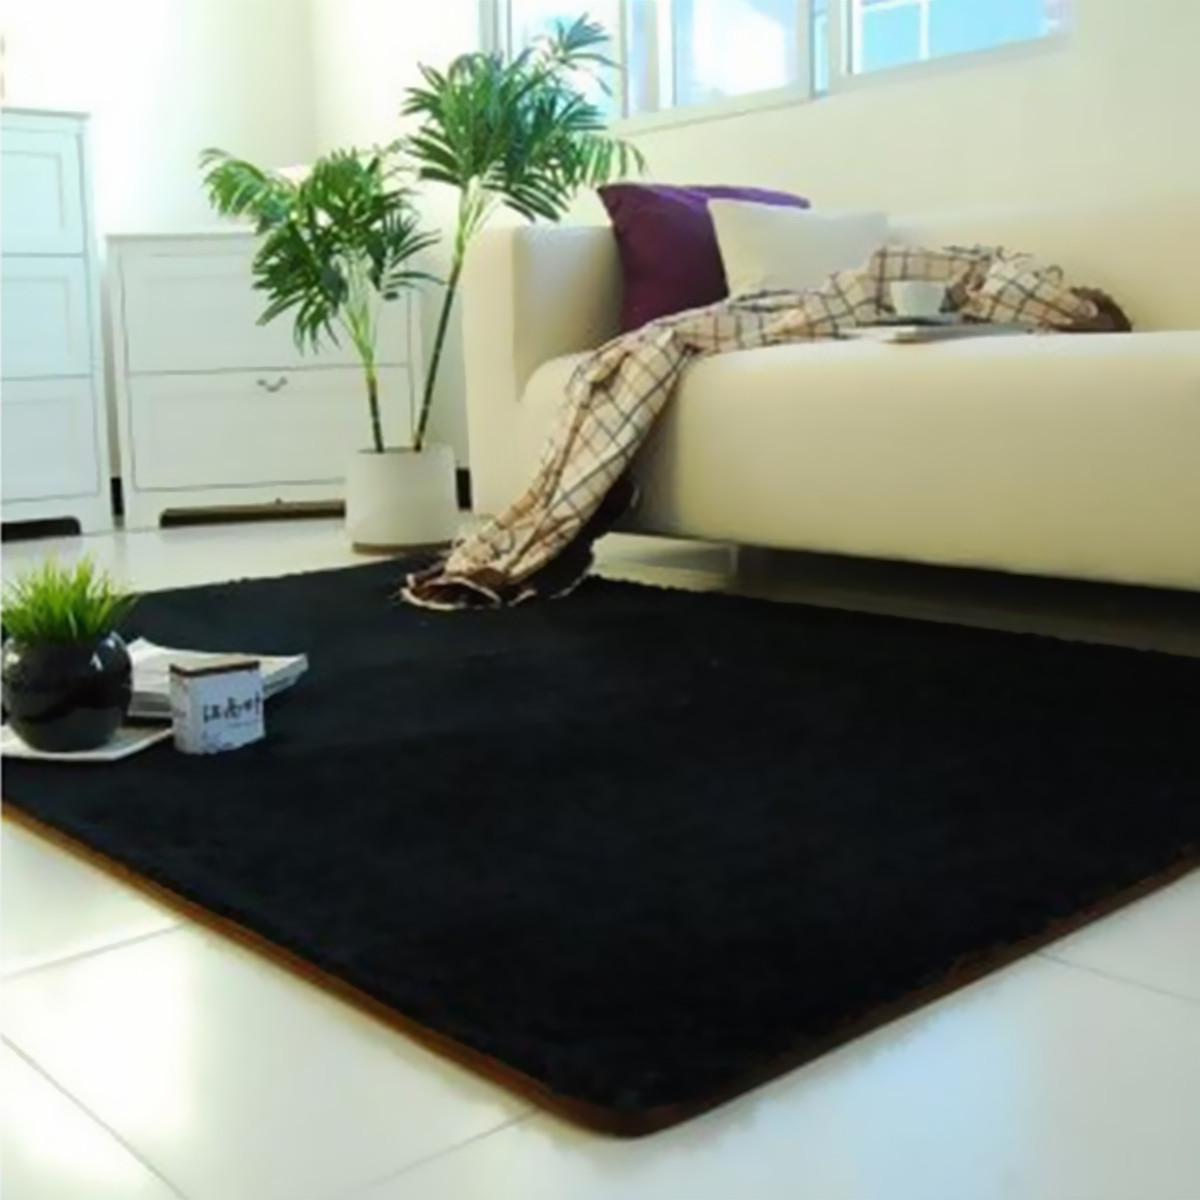 13 Colors 4 Sizes Modern Soft Fluffy Floor Rug Anti-skid Shag Shaggy Area Rug Home Bedroom Dining Room Carpet Child Play Mat Yoga Mat